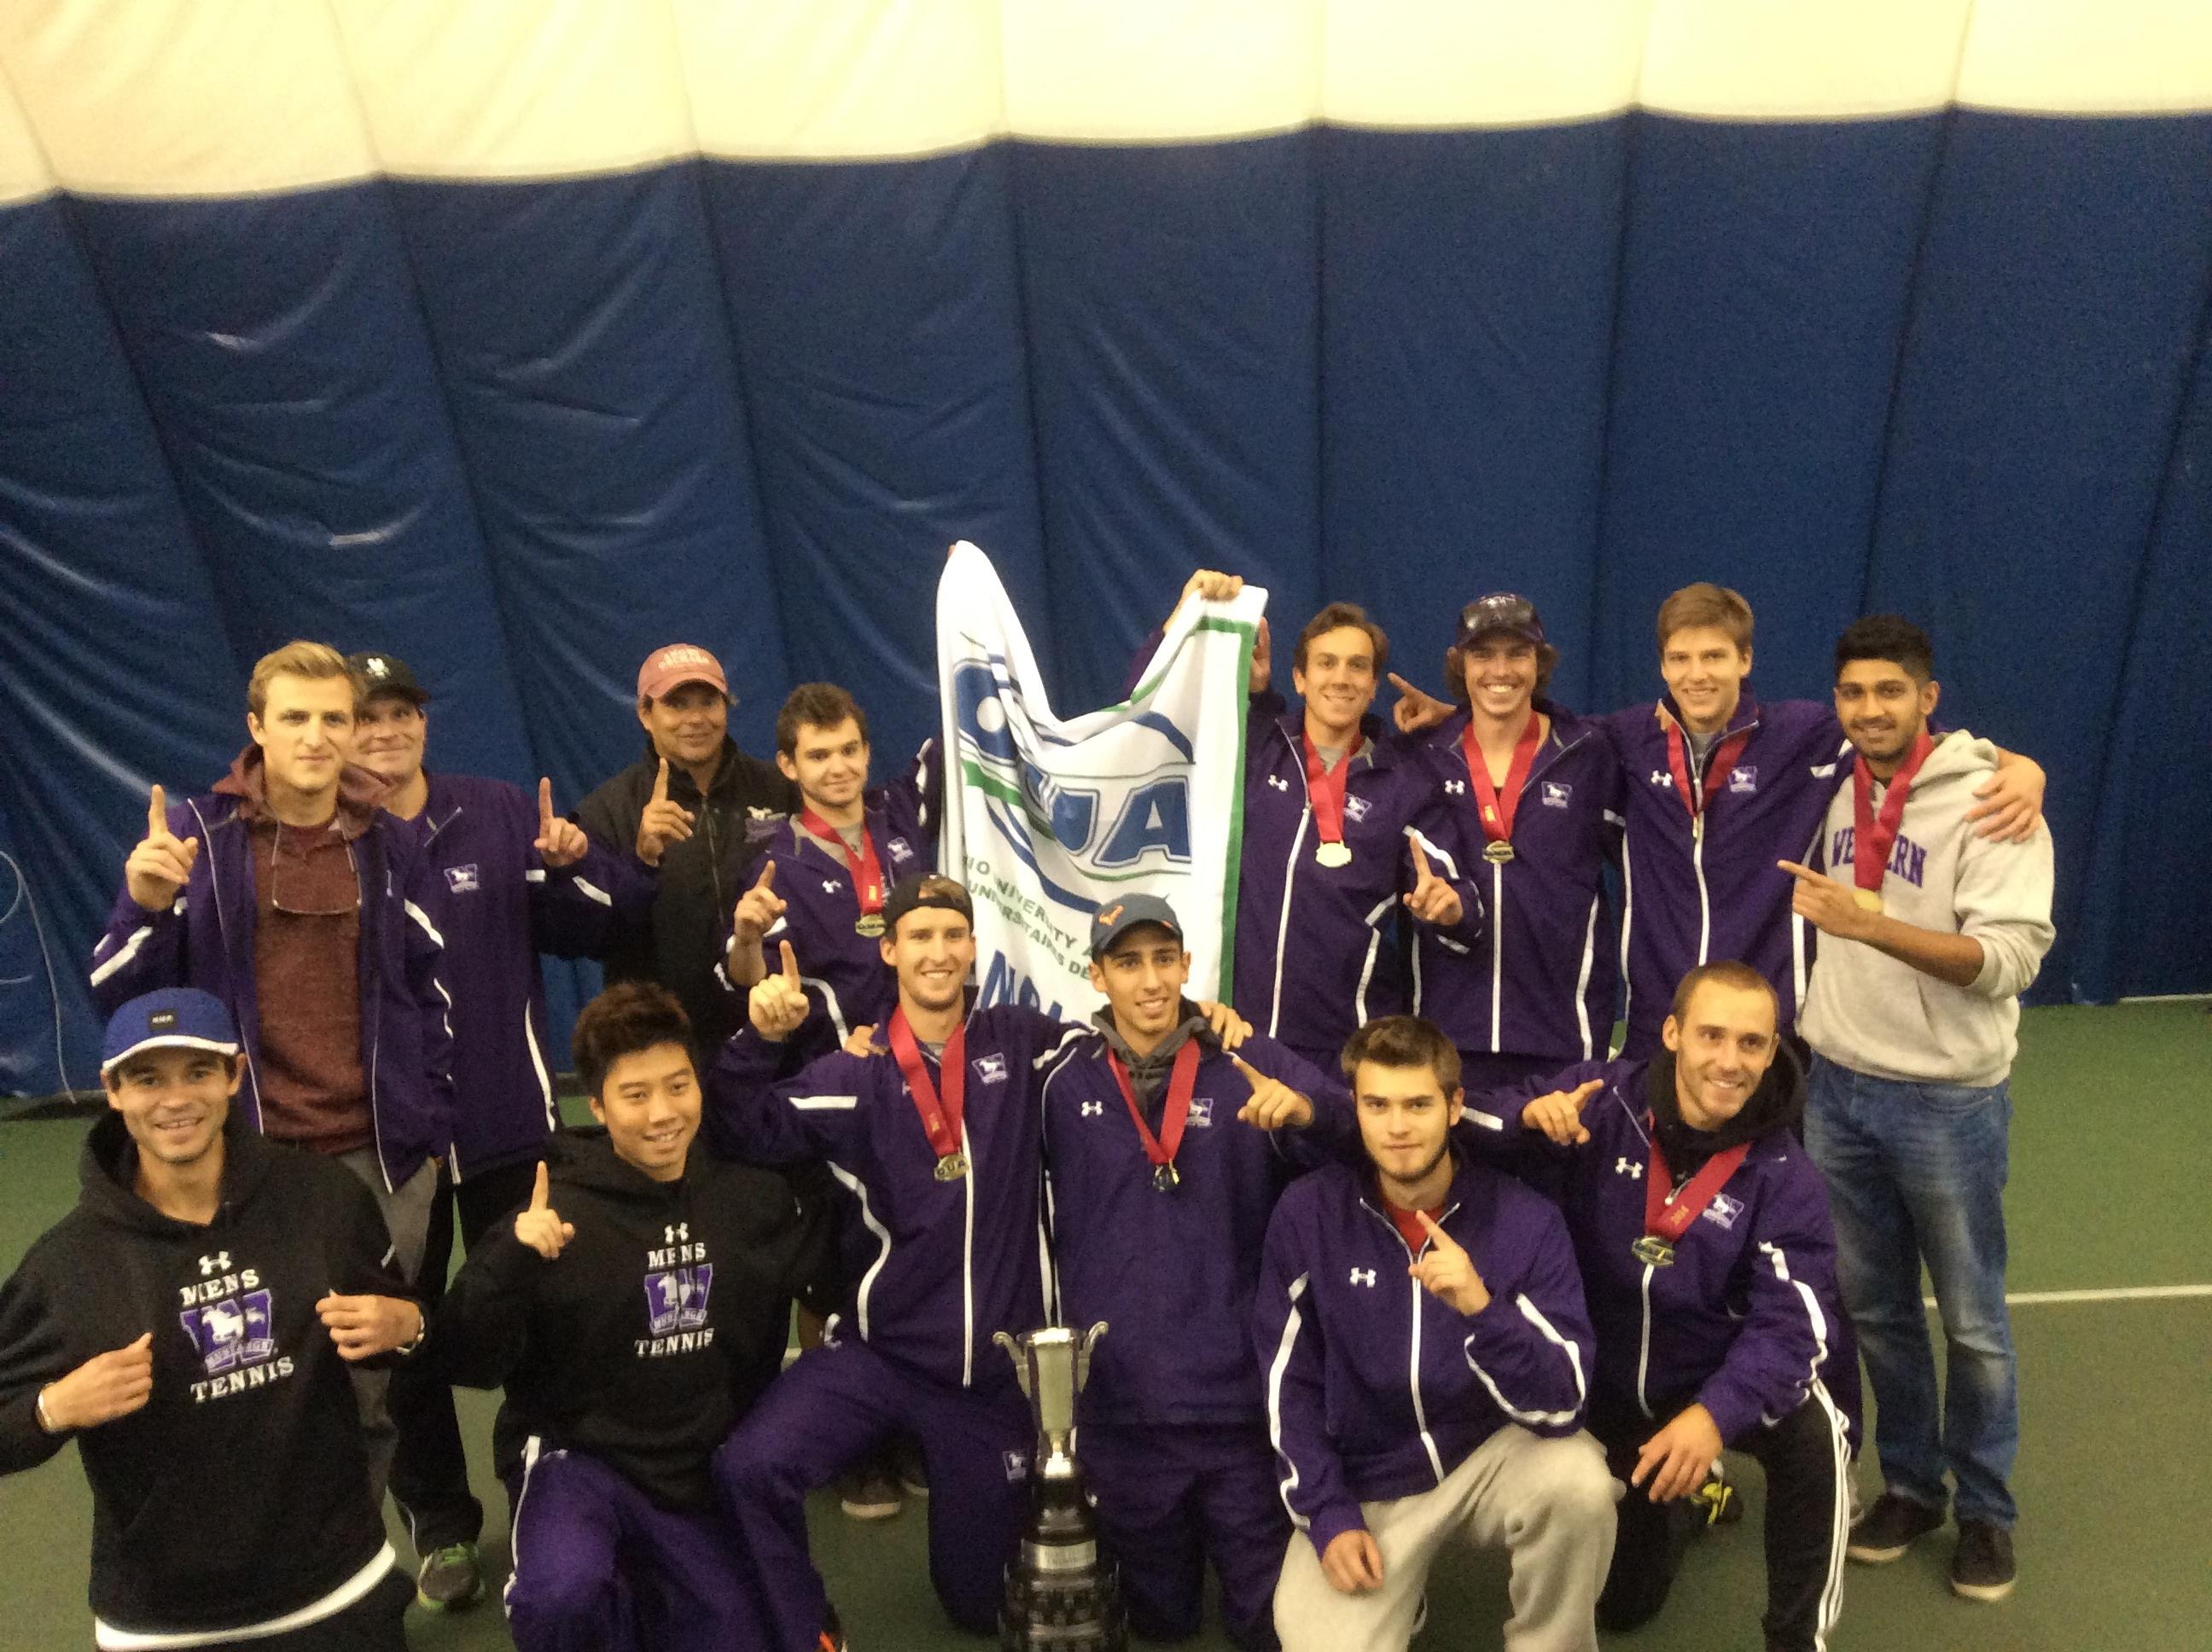 2014 OUA Men's Champions-3peat